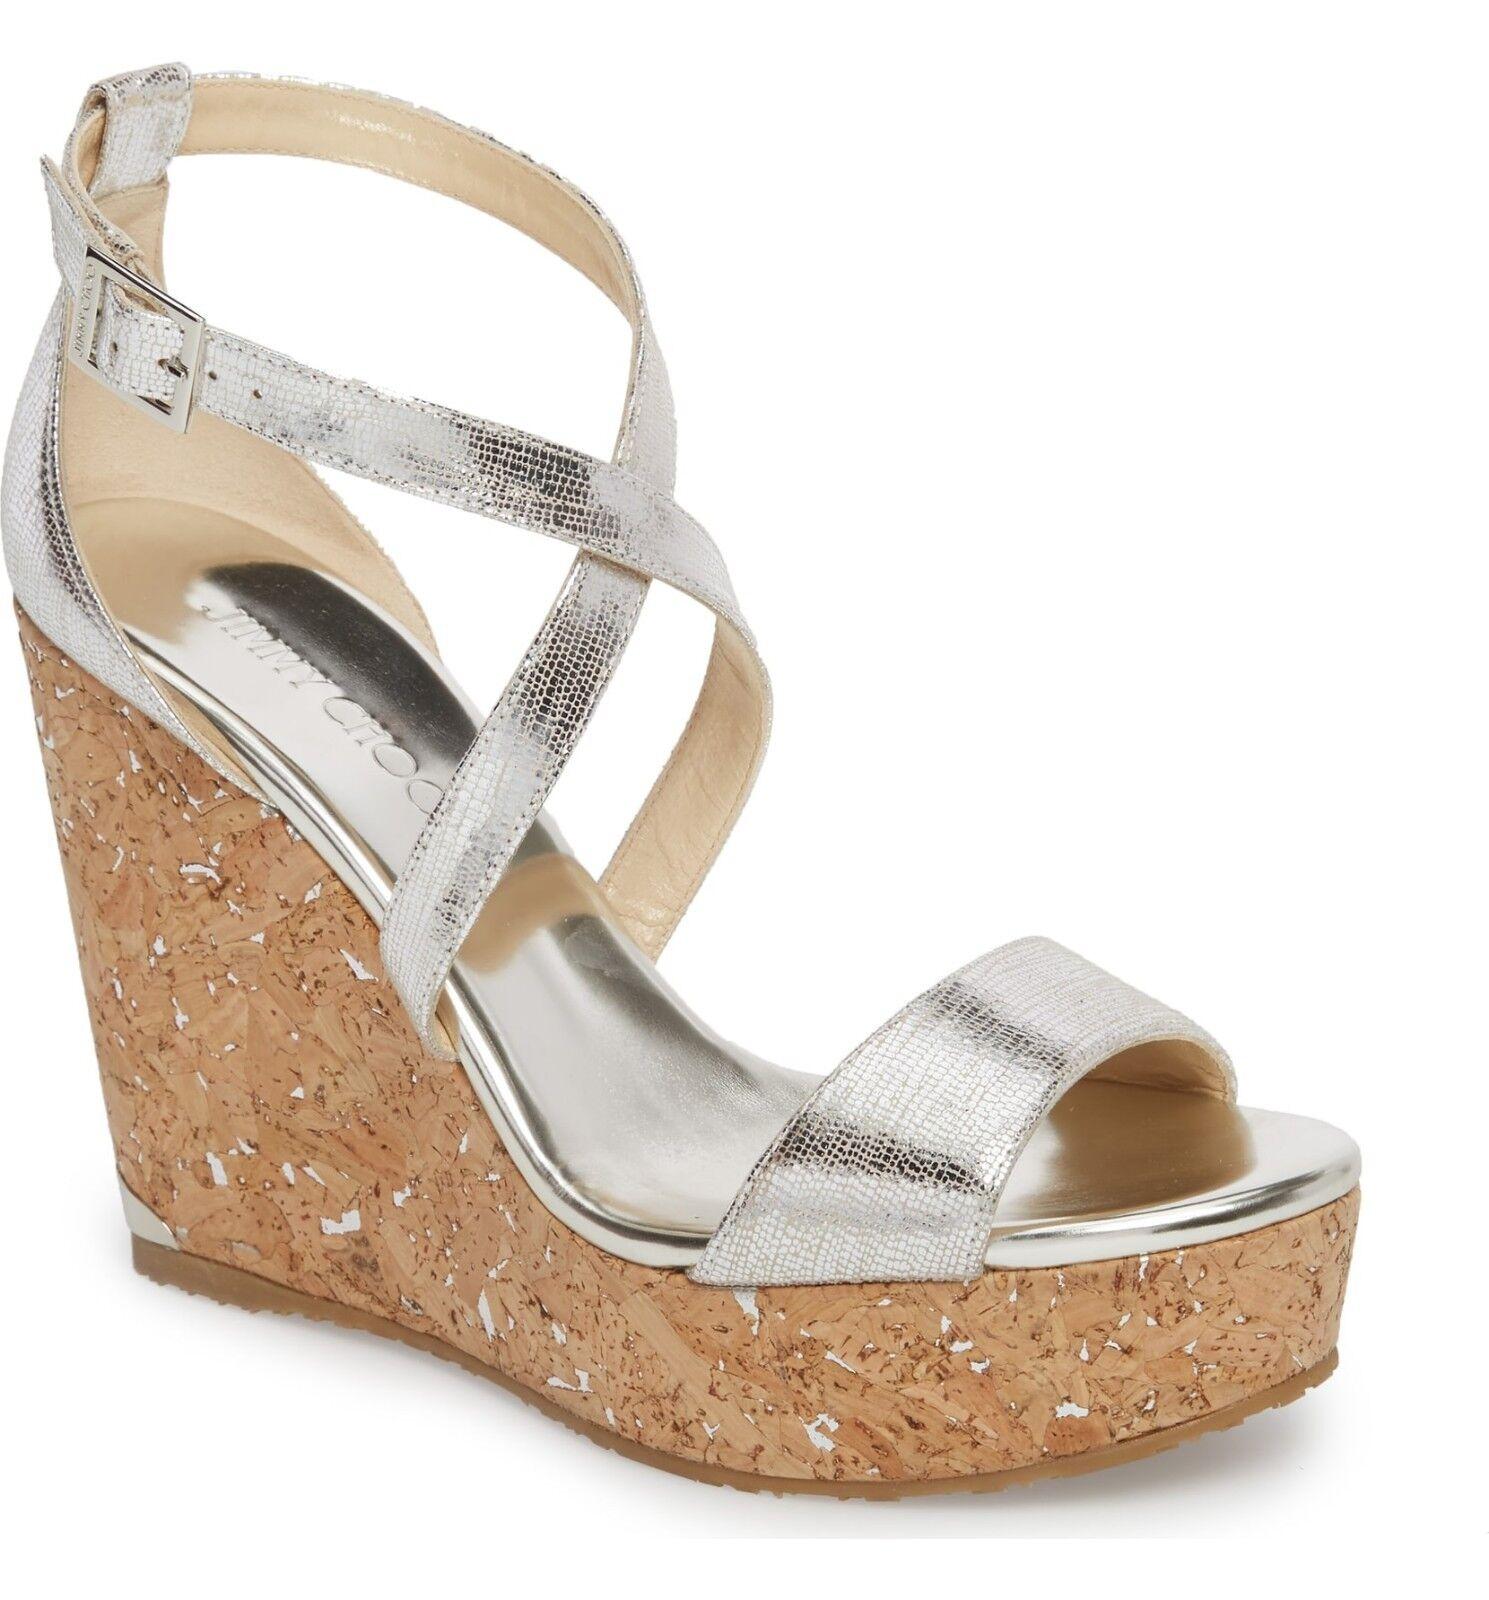 NIB NEW Jimmy Choo Portia argent platform wedge sandals 39 8.5 9